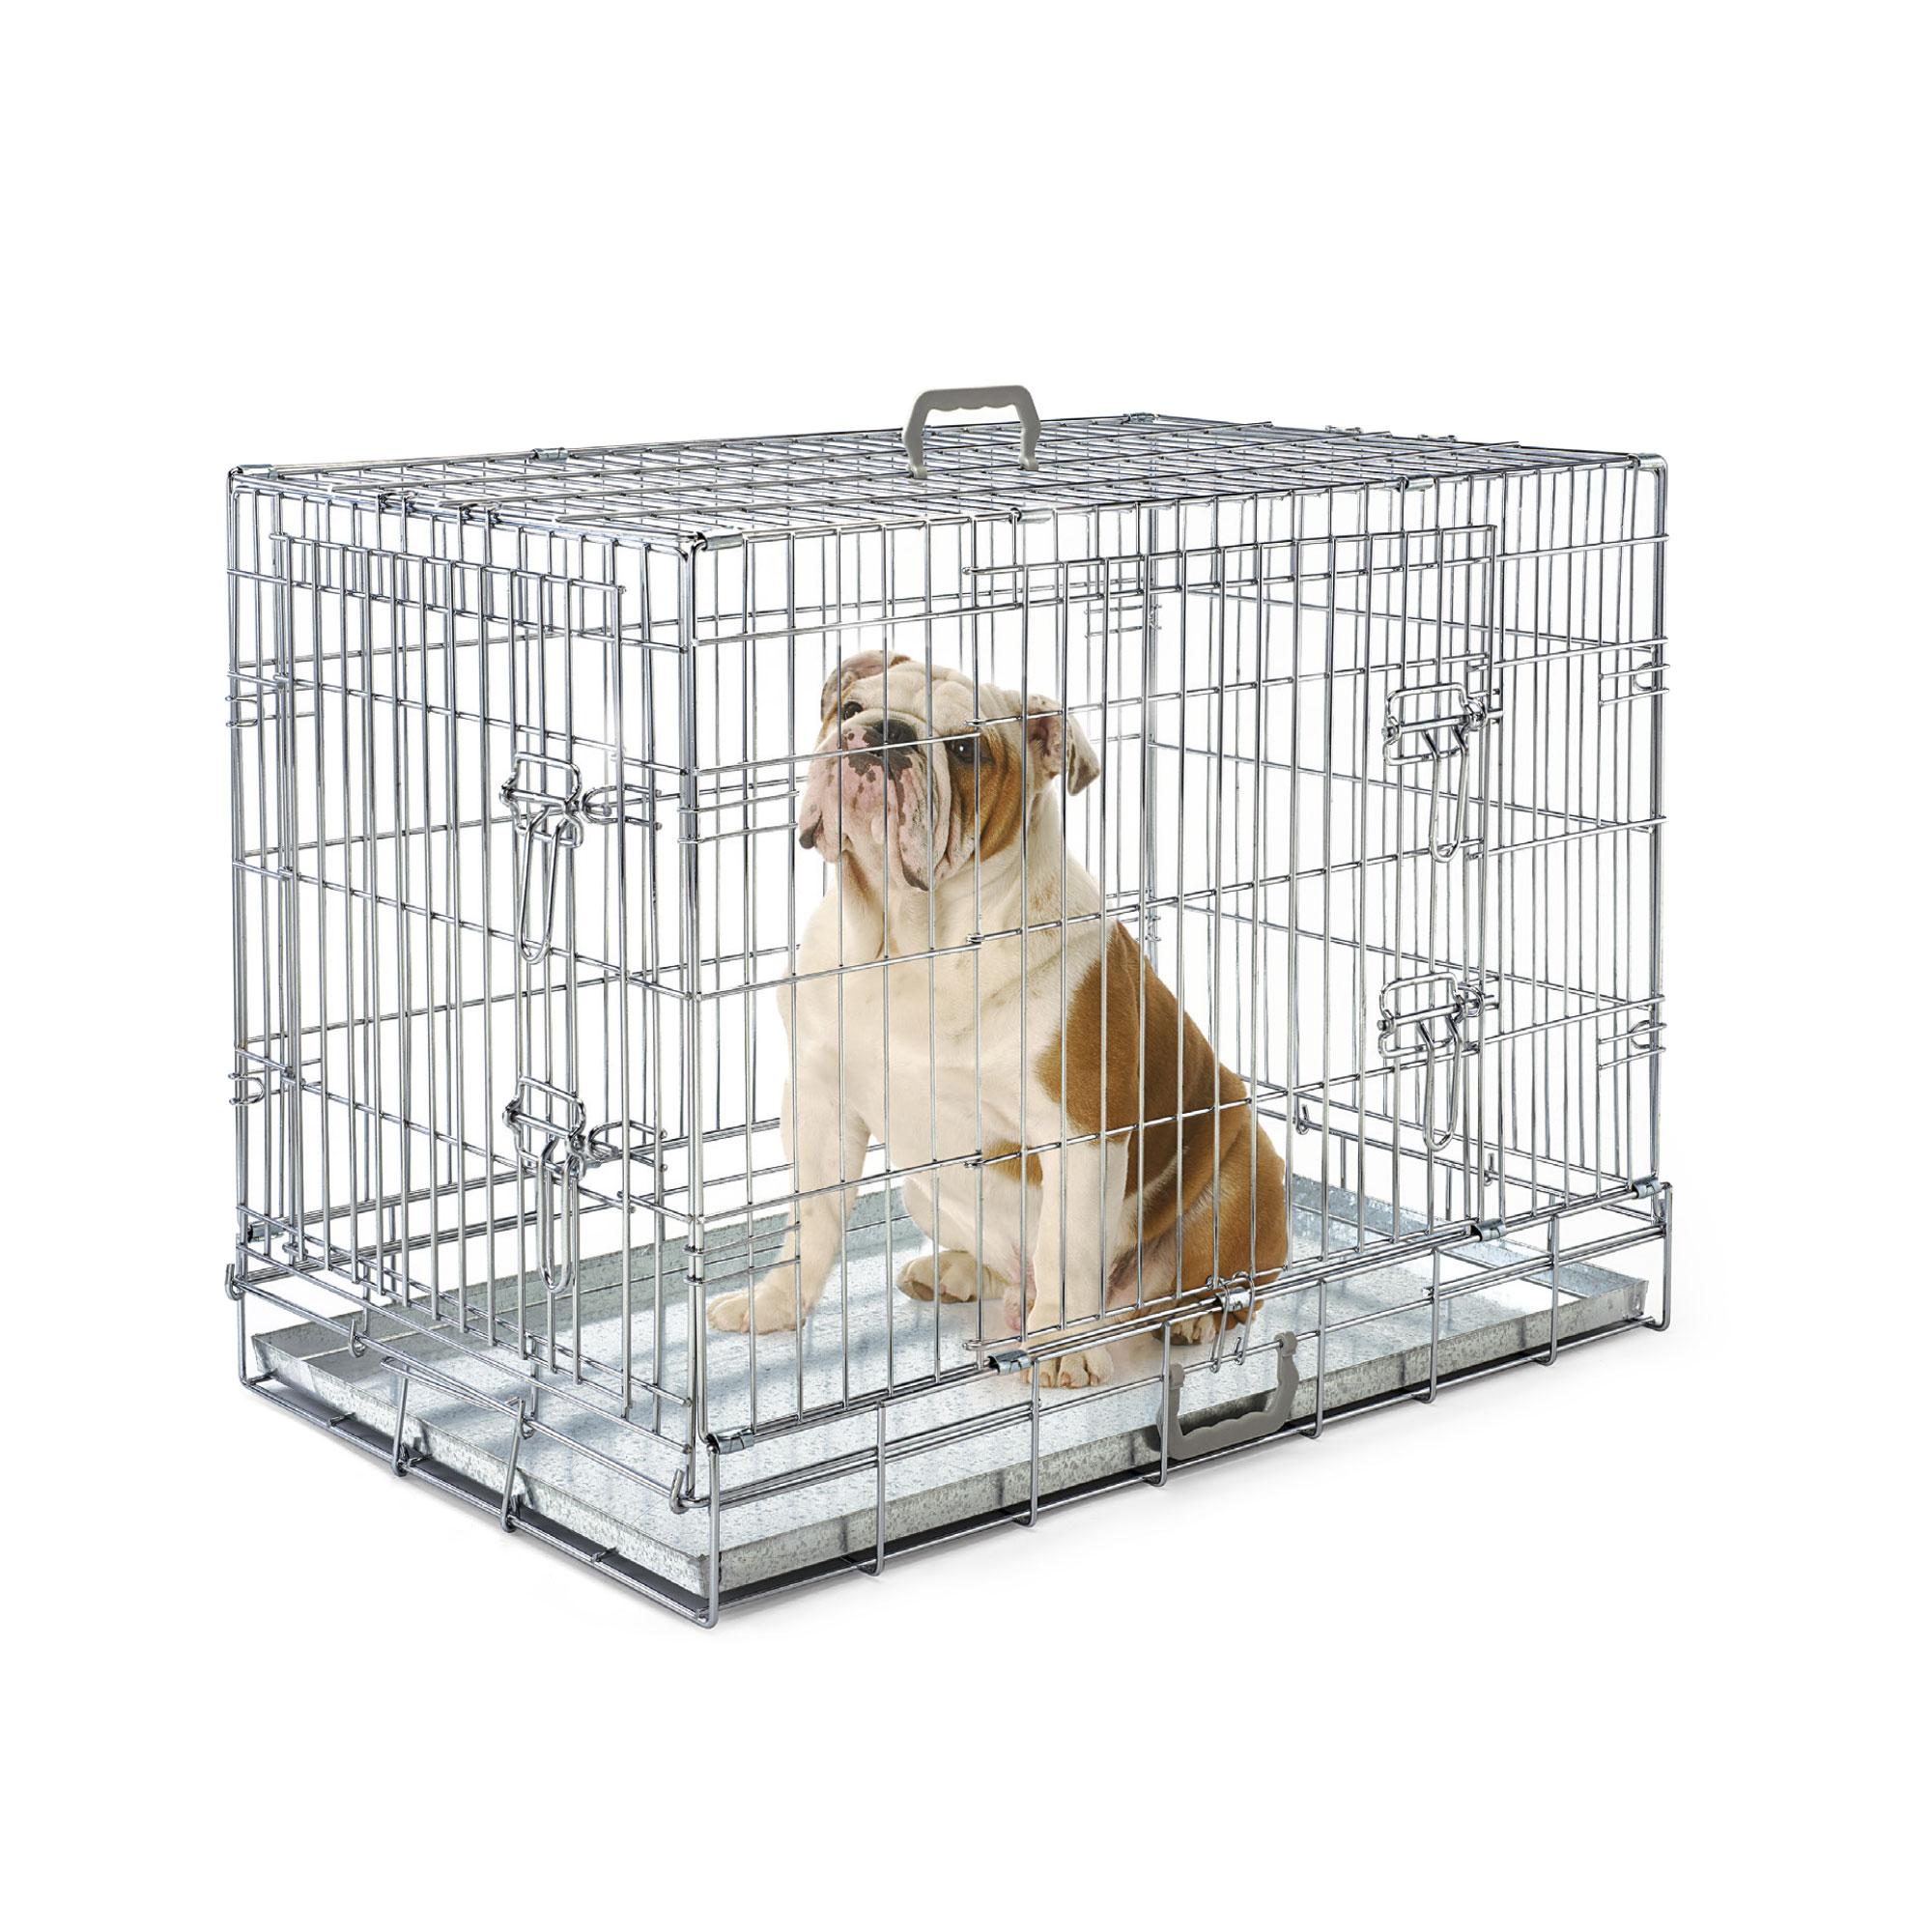 Trasportini per Cani e Gatti - BOX CANE